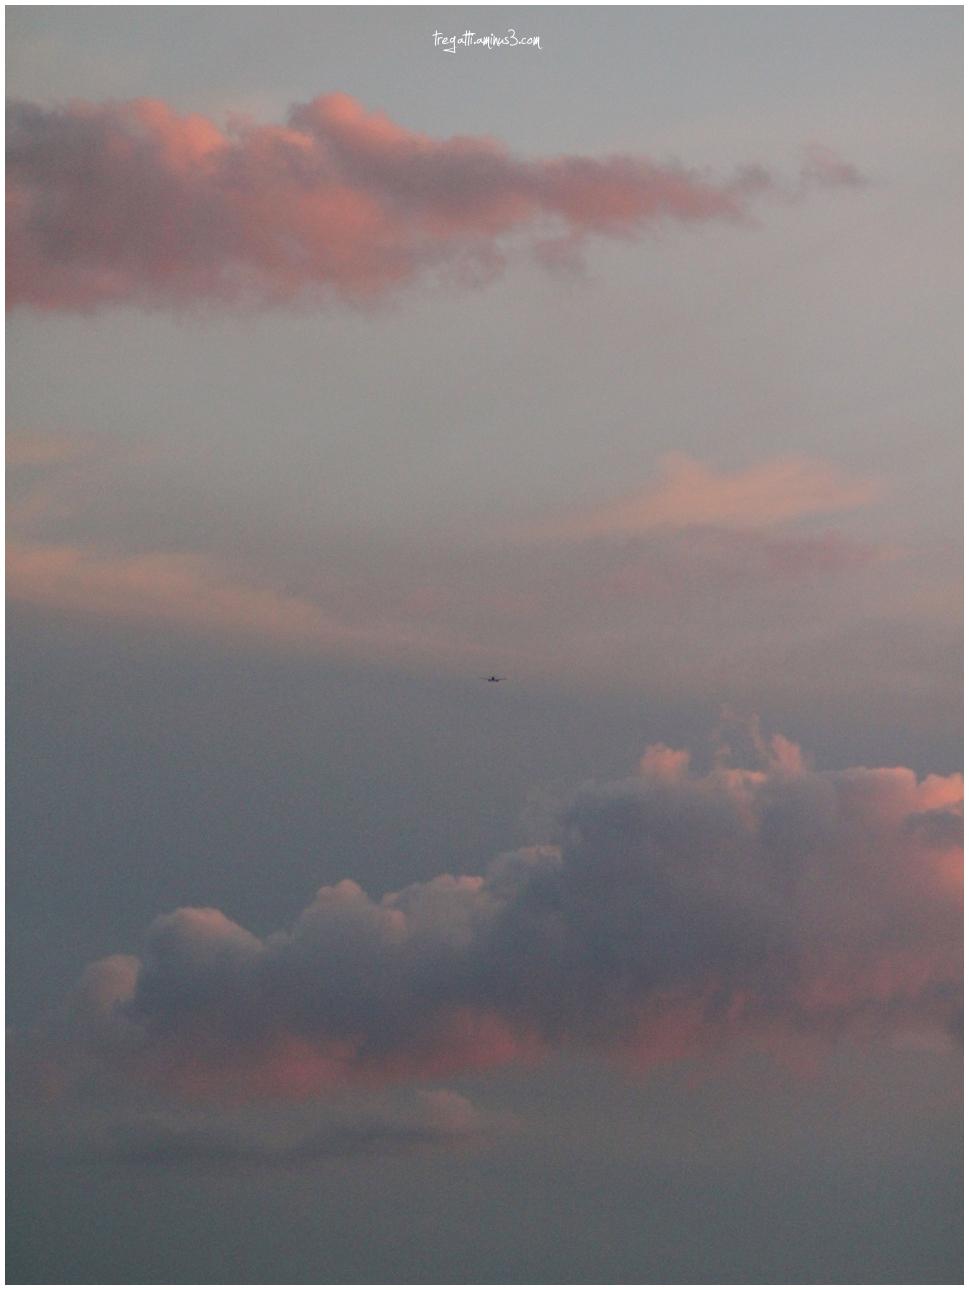 clouds, plane, sunset